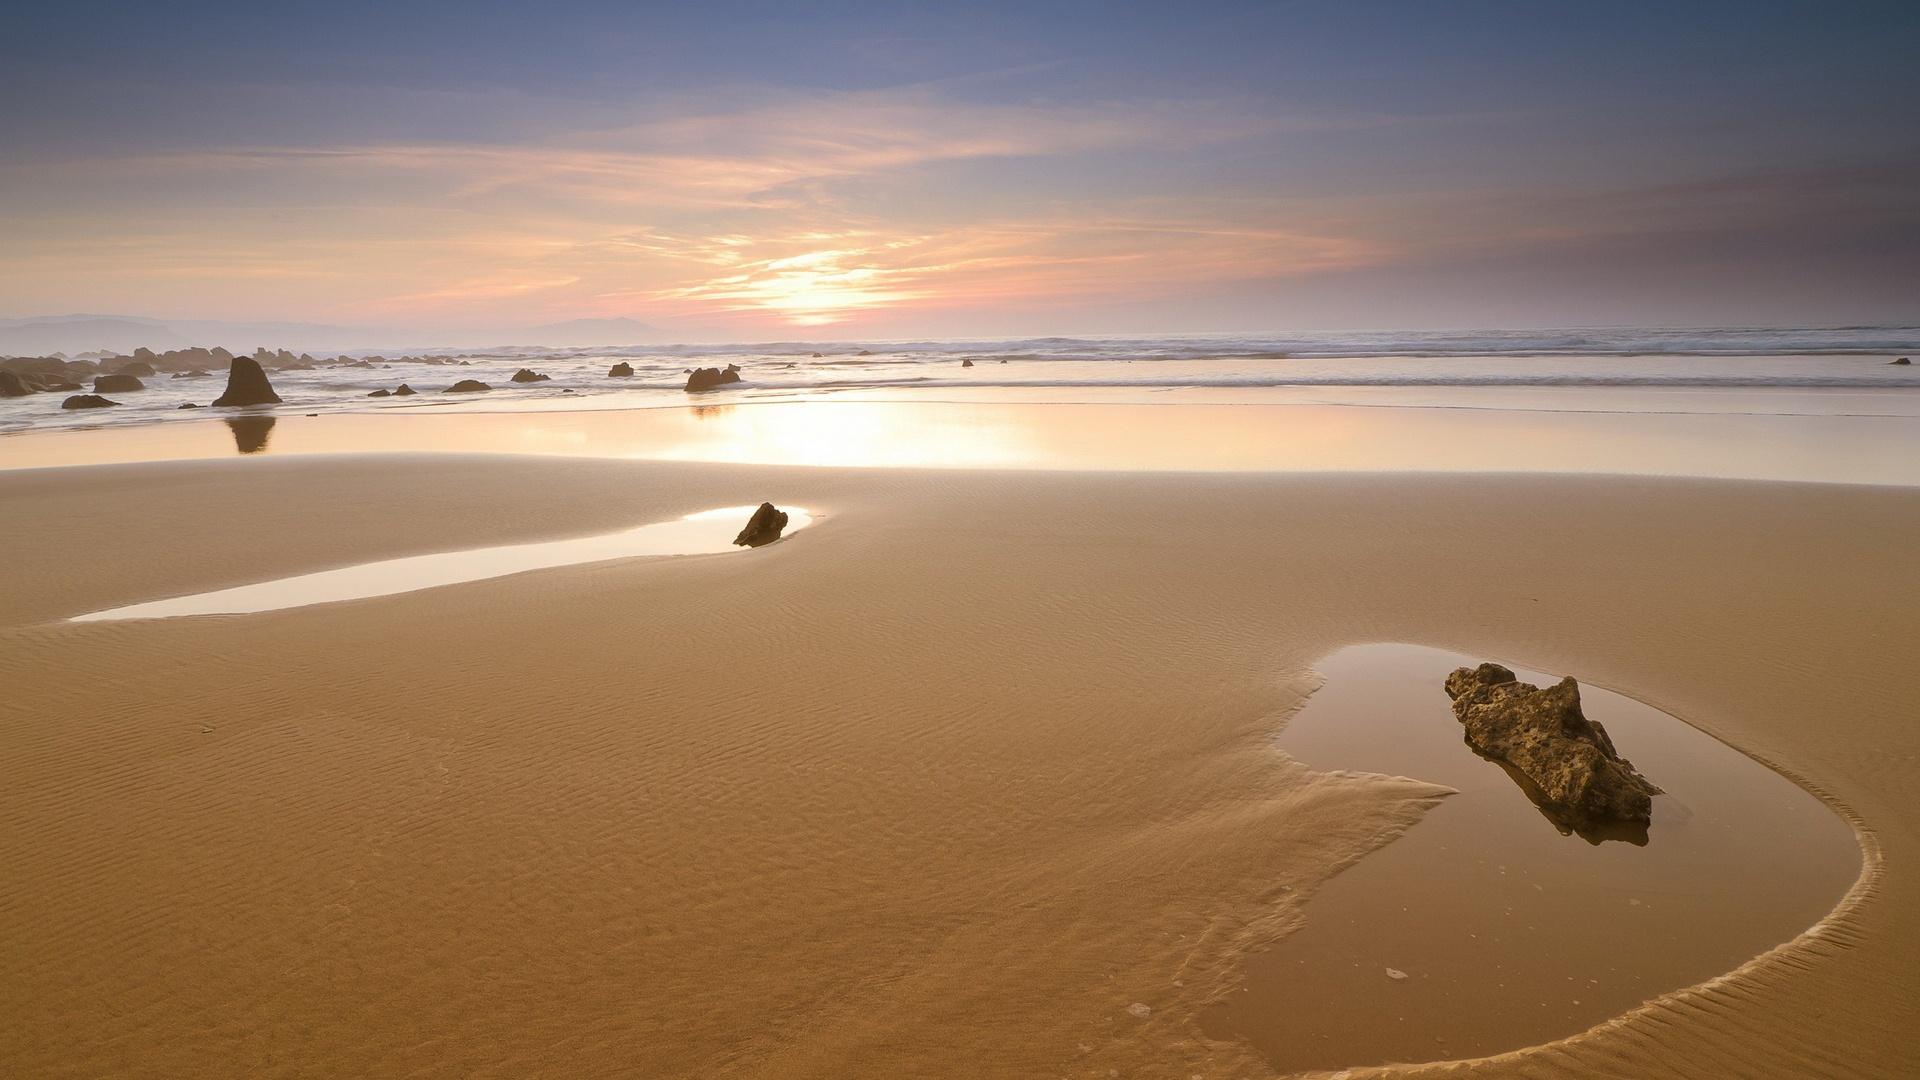 Beach free pic